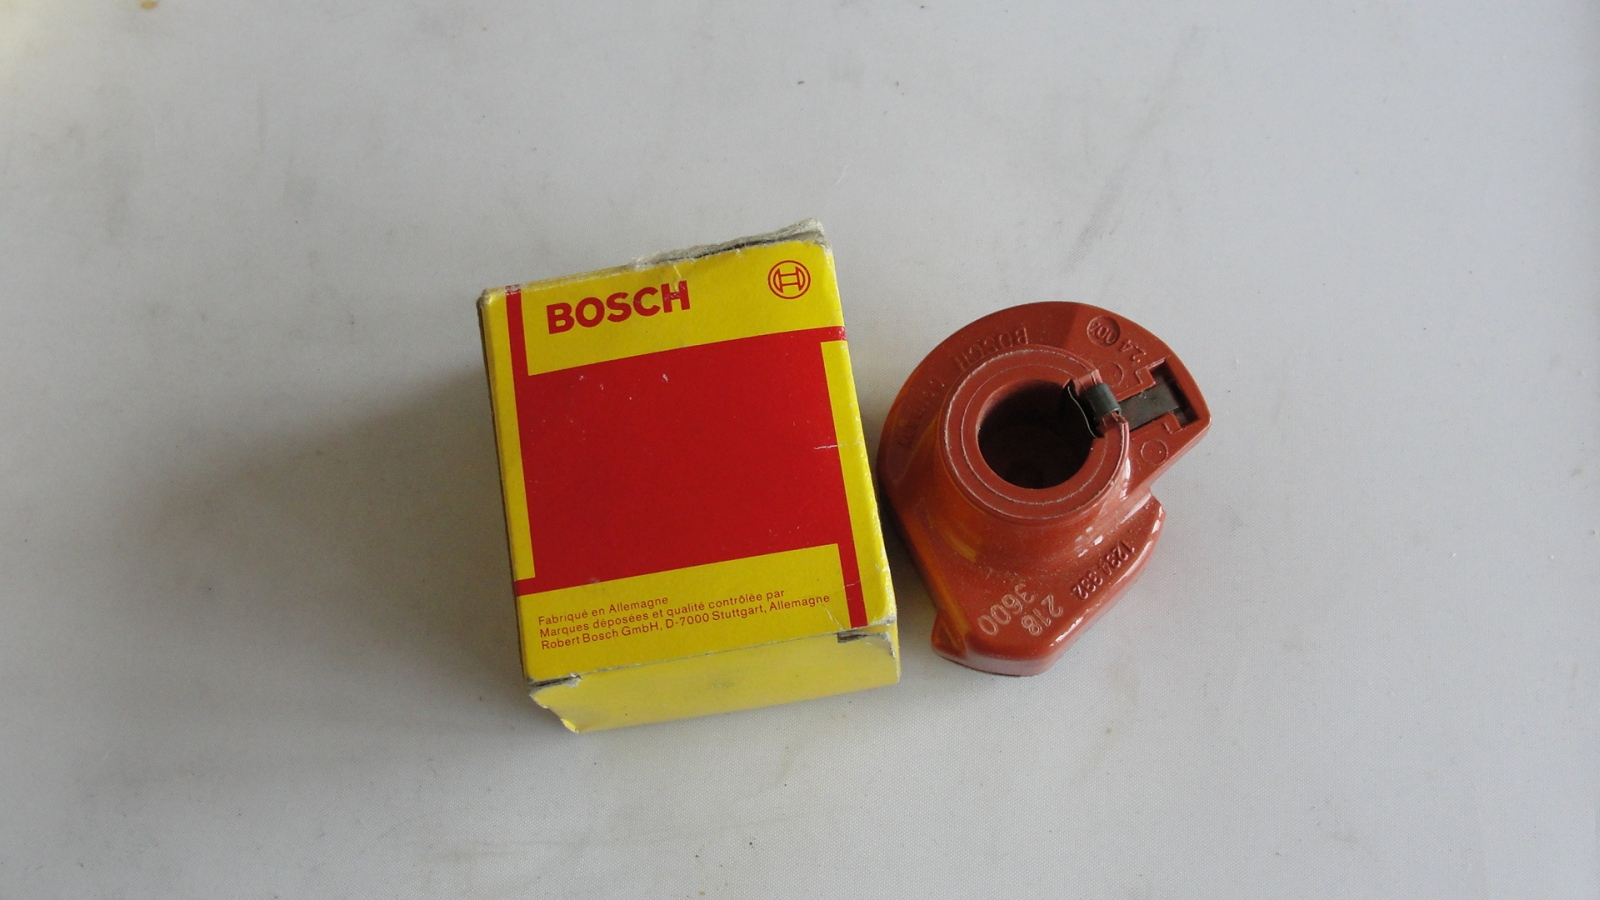 Bosch Zündverteilerläufer 1234332218 Rotor distributor distributeur distribuidor